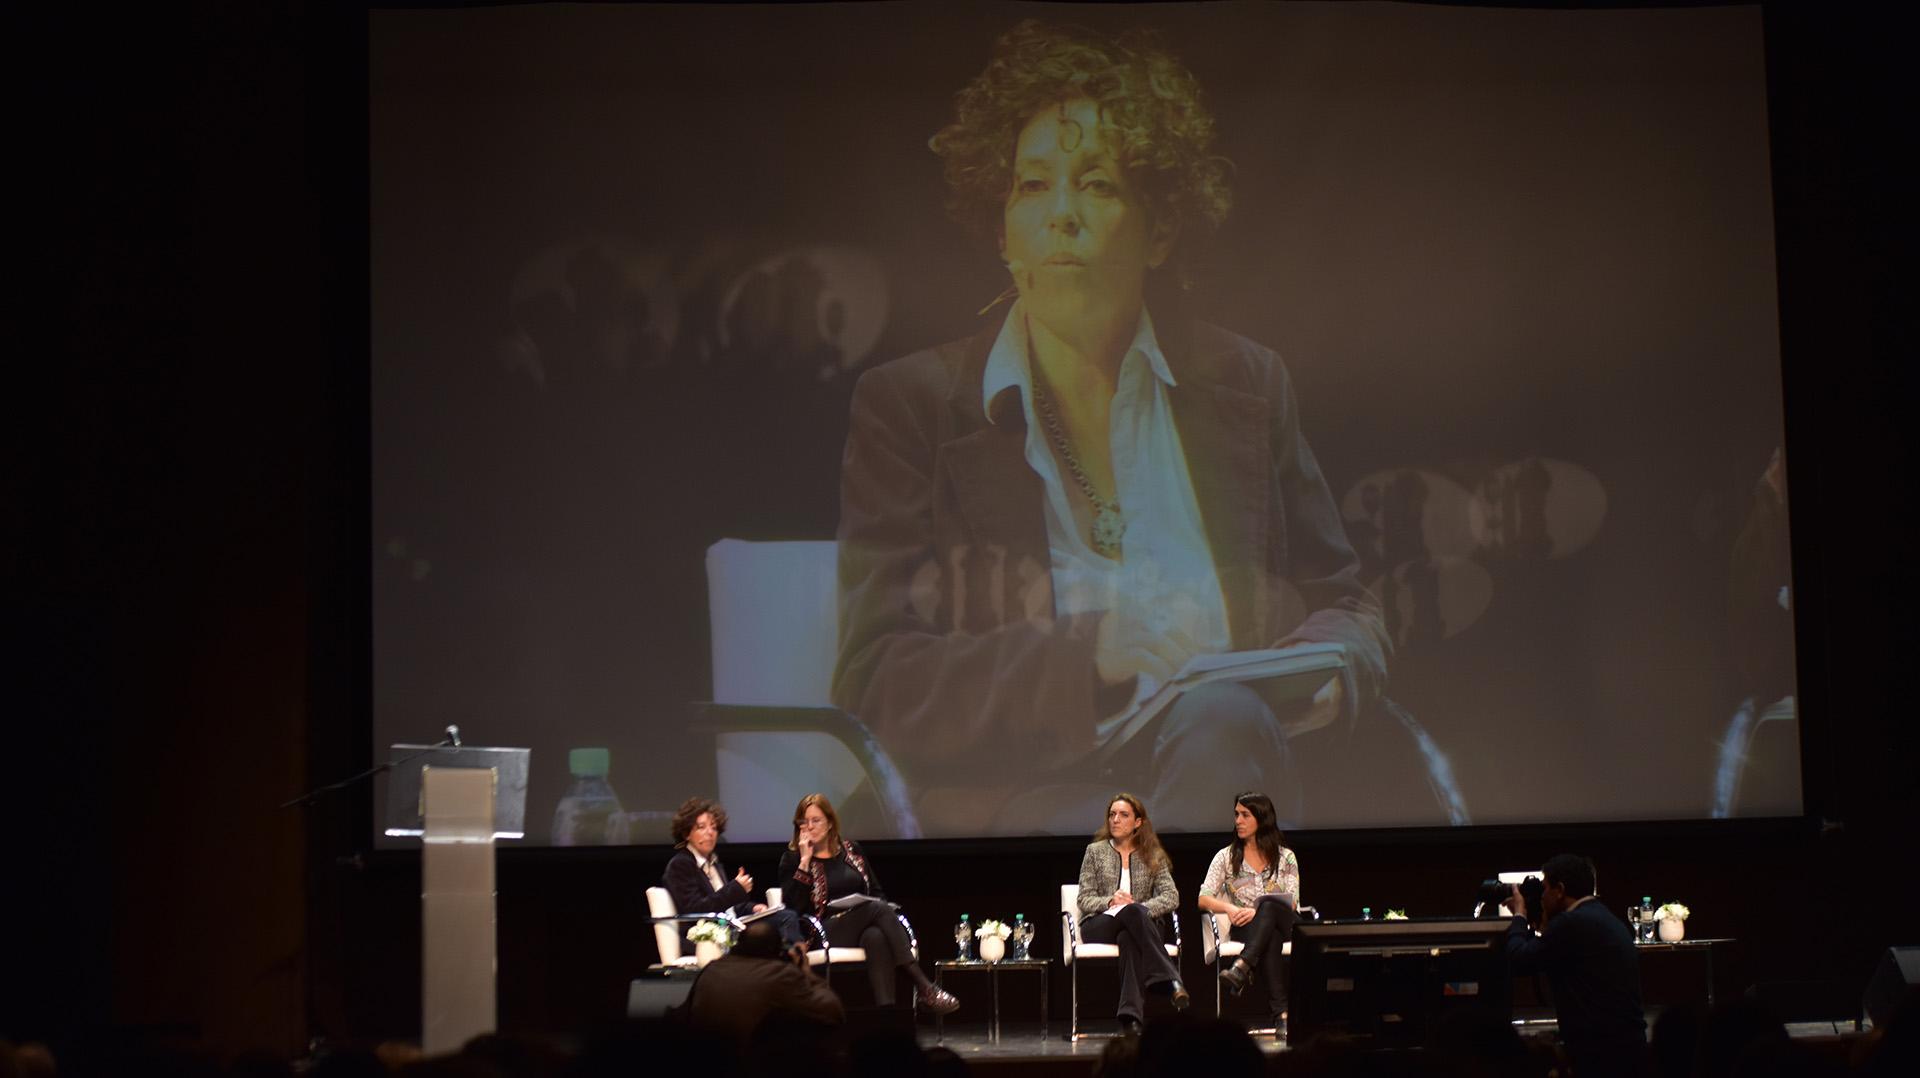 La periodista Marta Dillon fue la coordinadora del primer panel